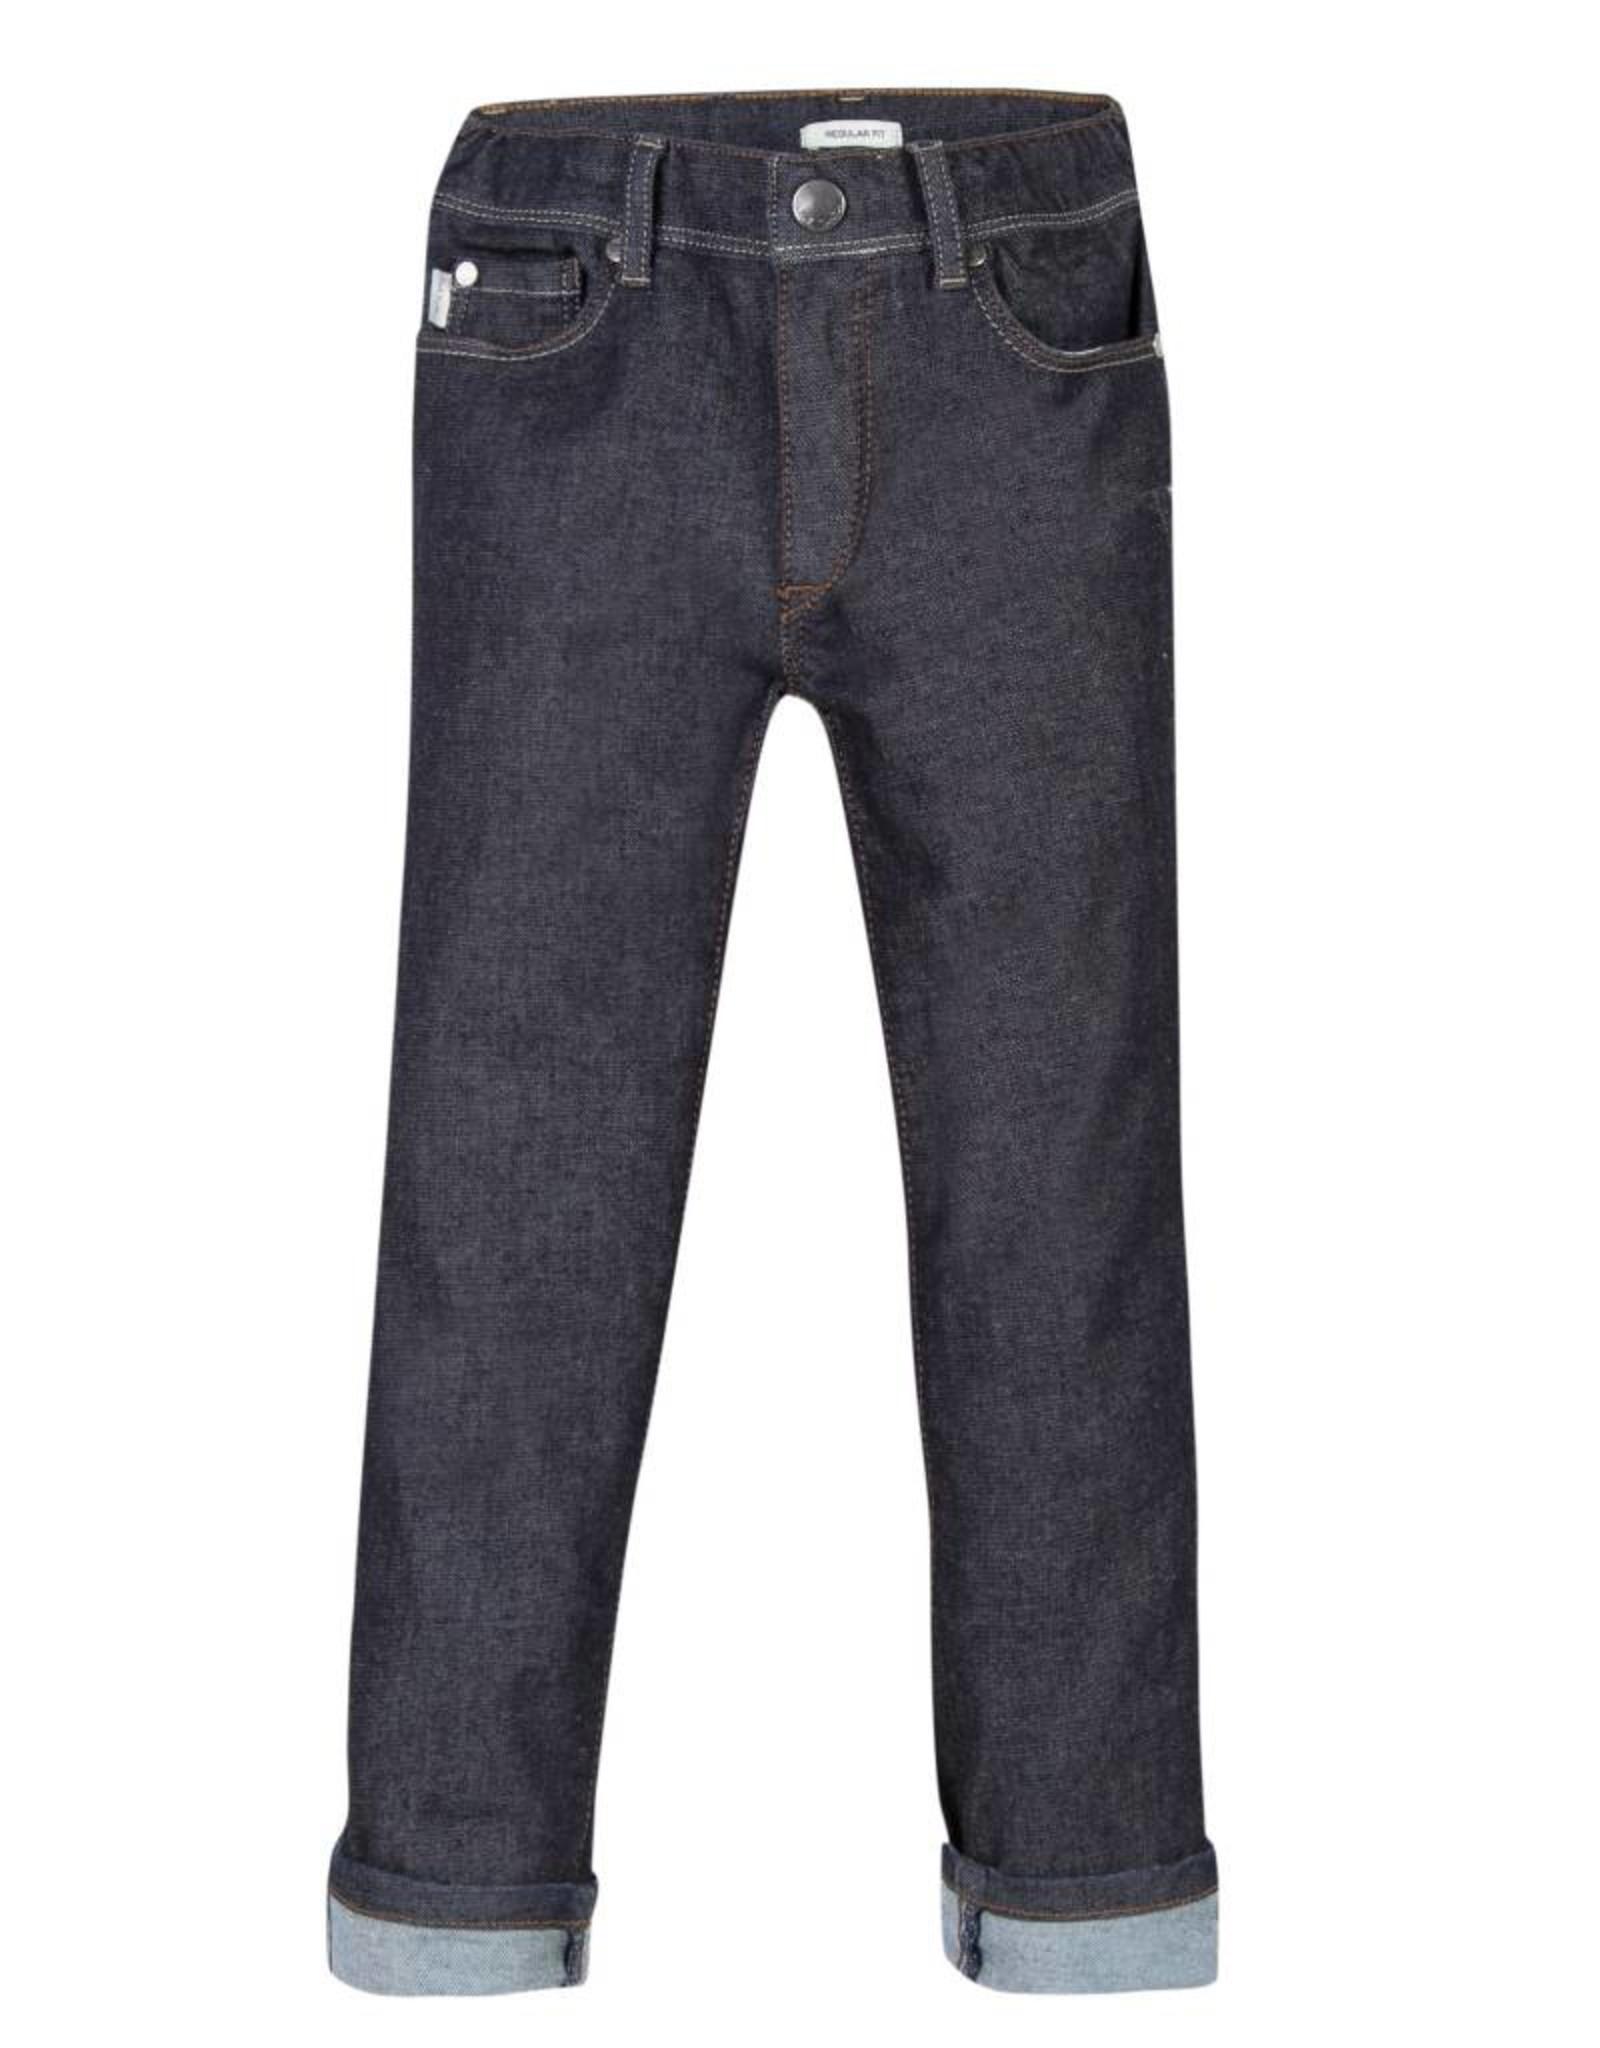 Radcliffe Jeans